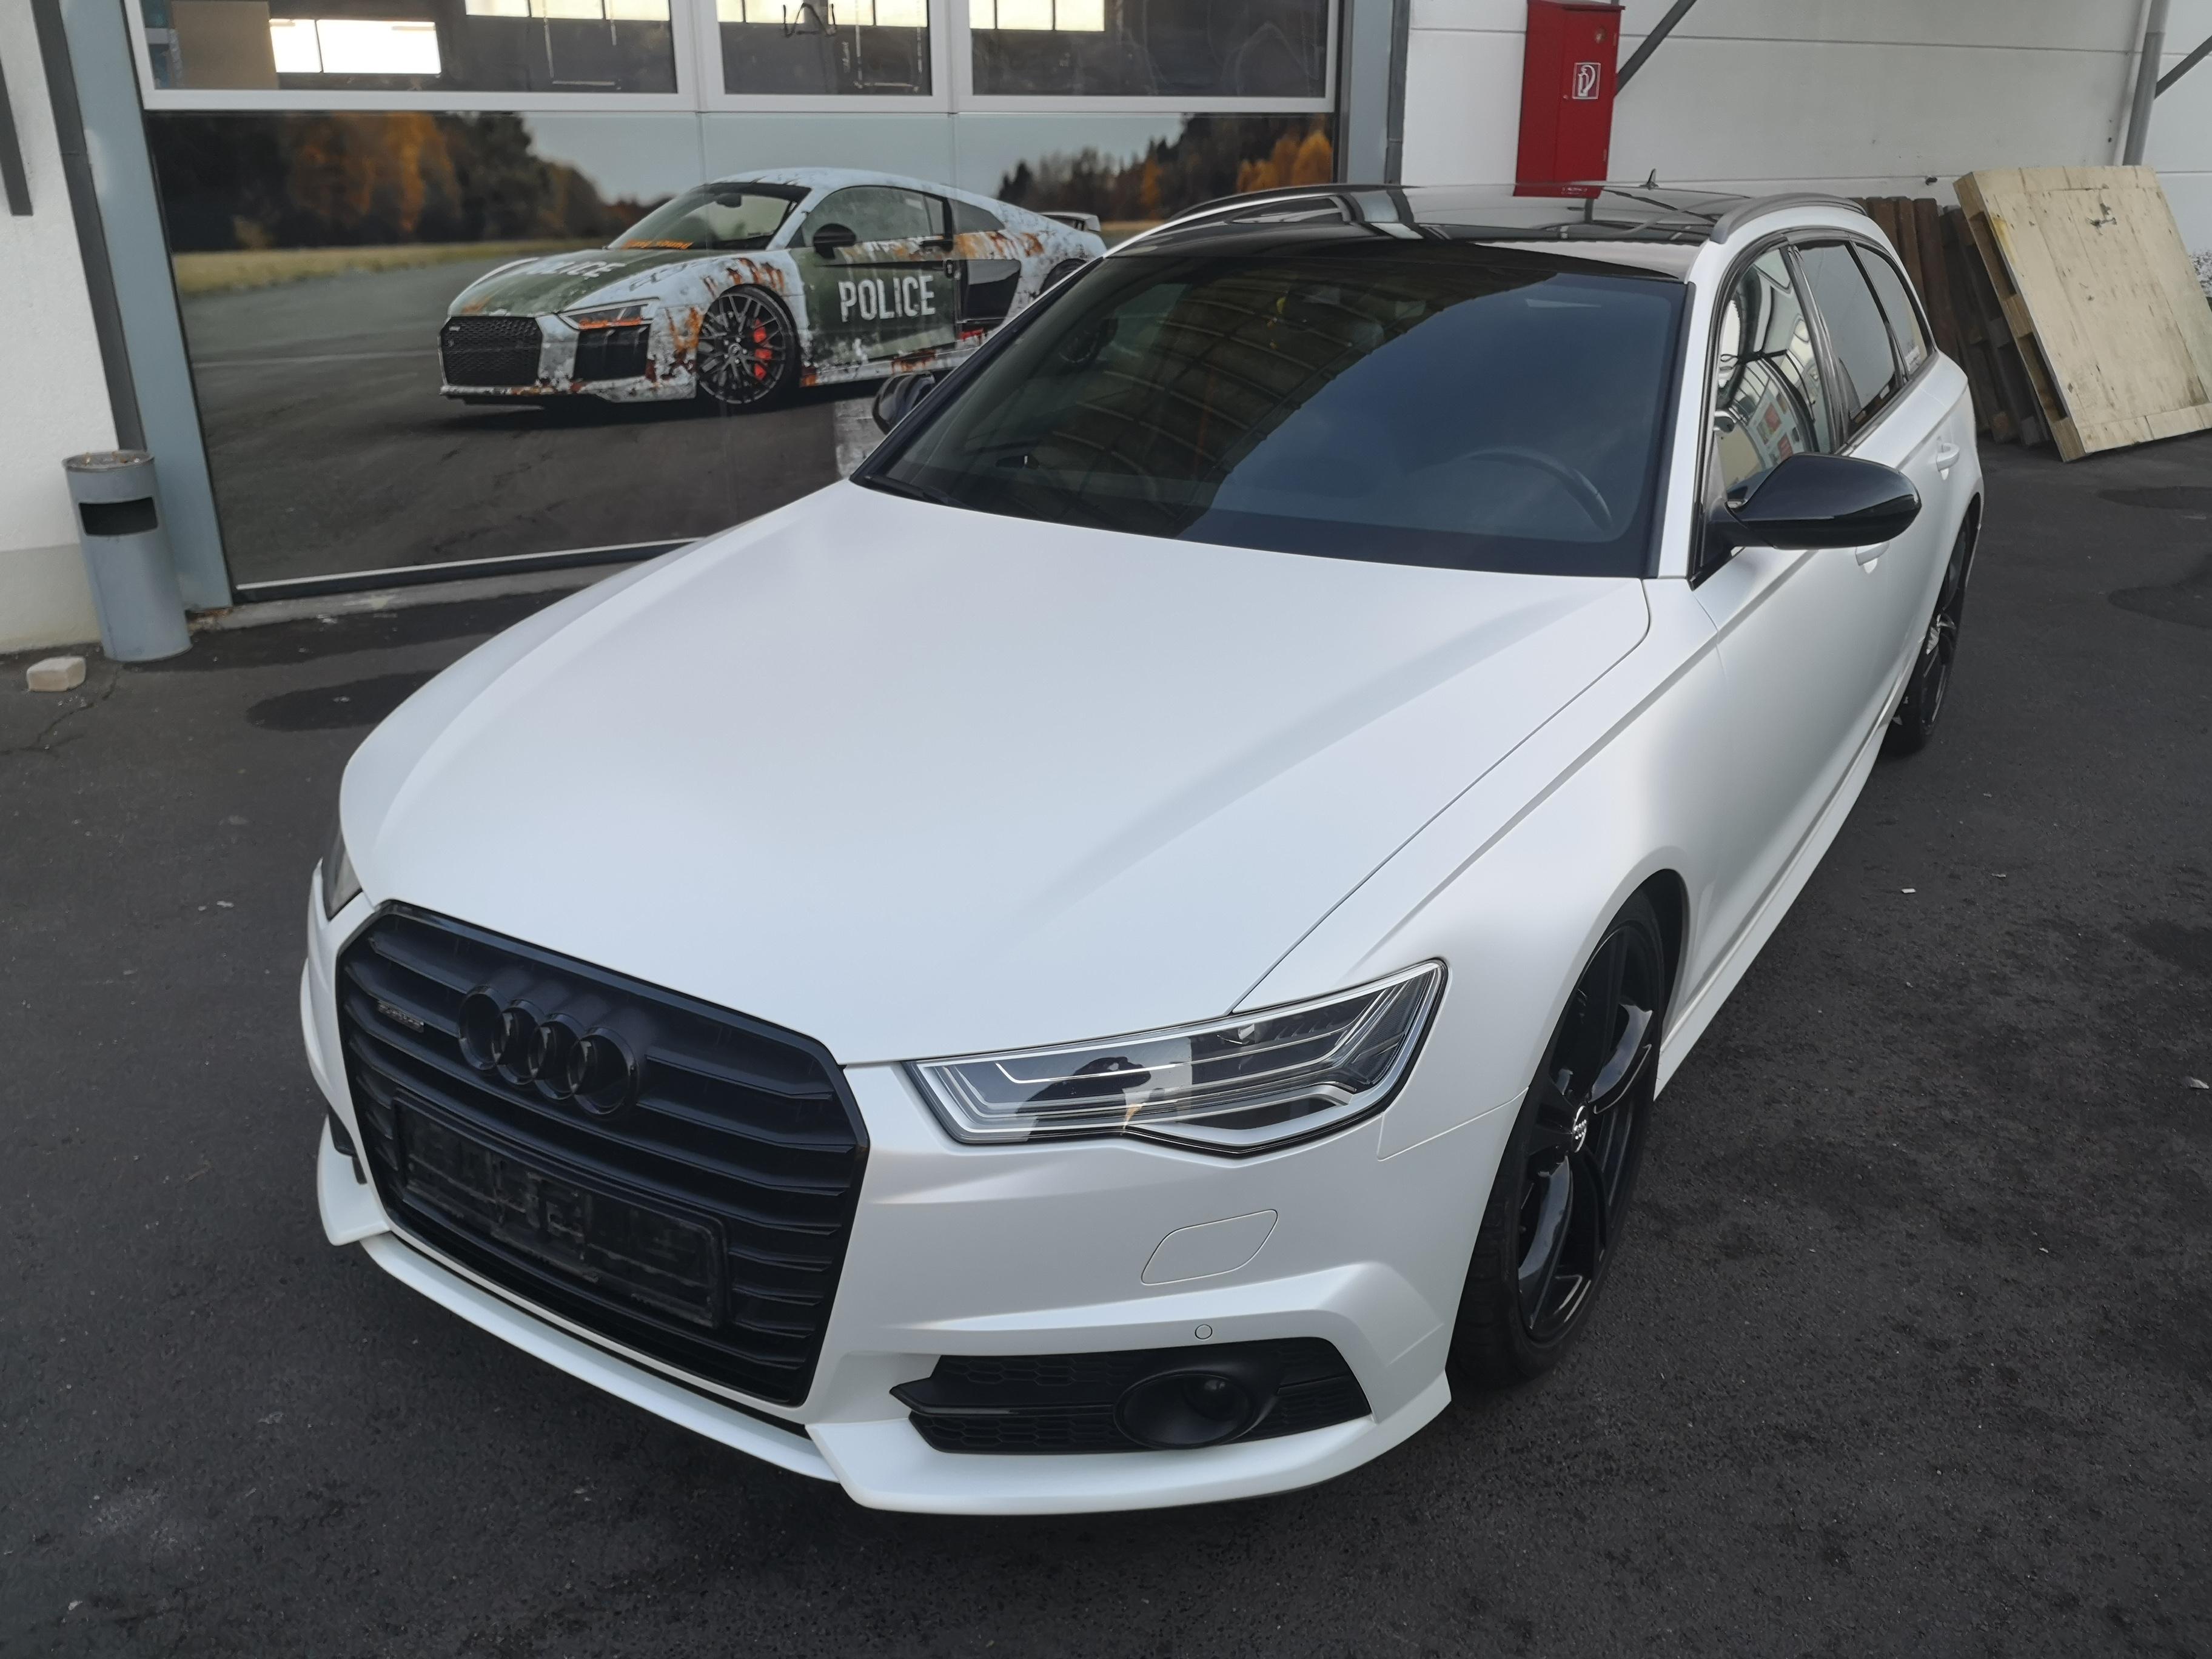 Audi A6 4G Avant Komplettfolierung in Satin Pearl White